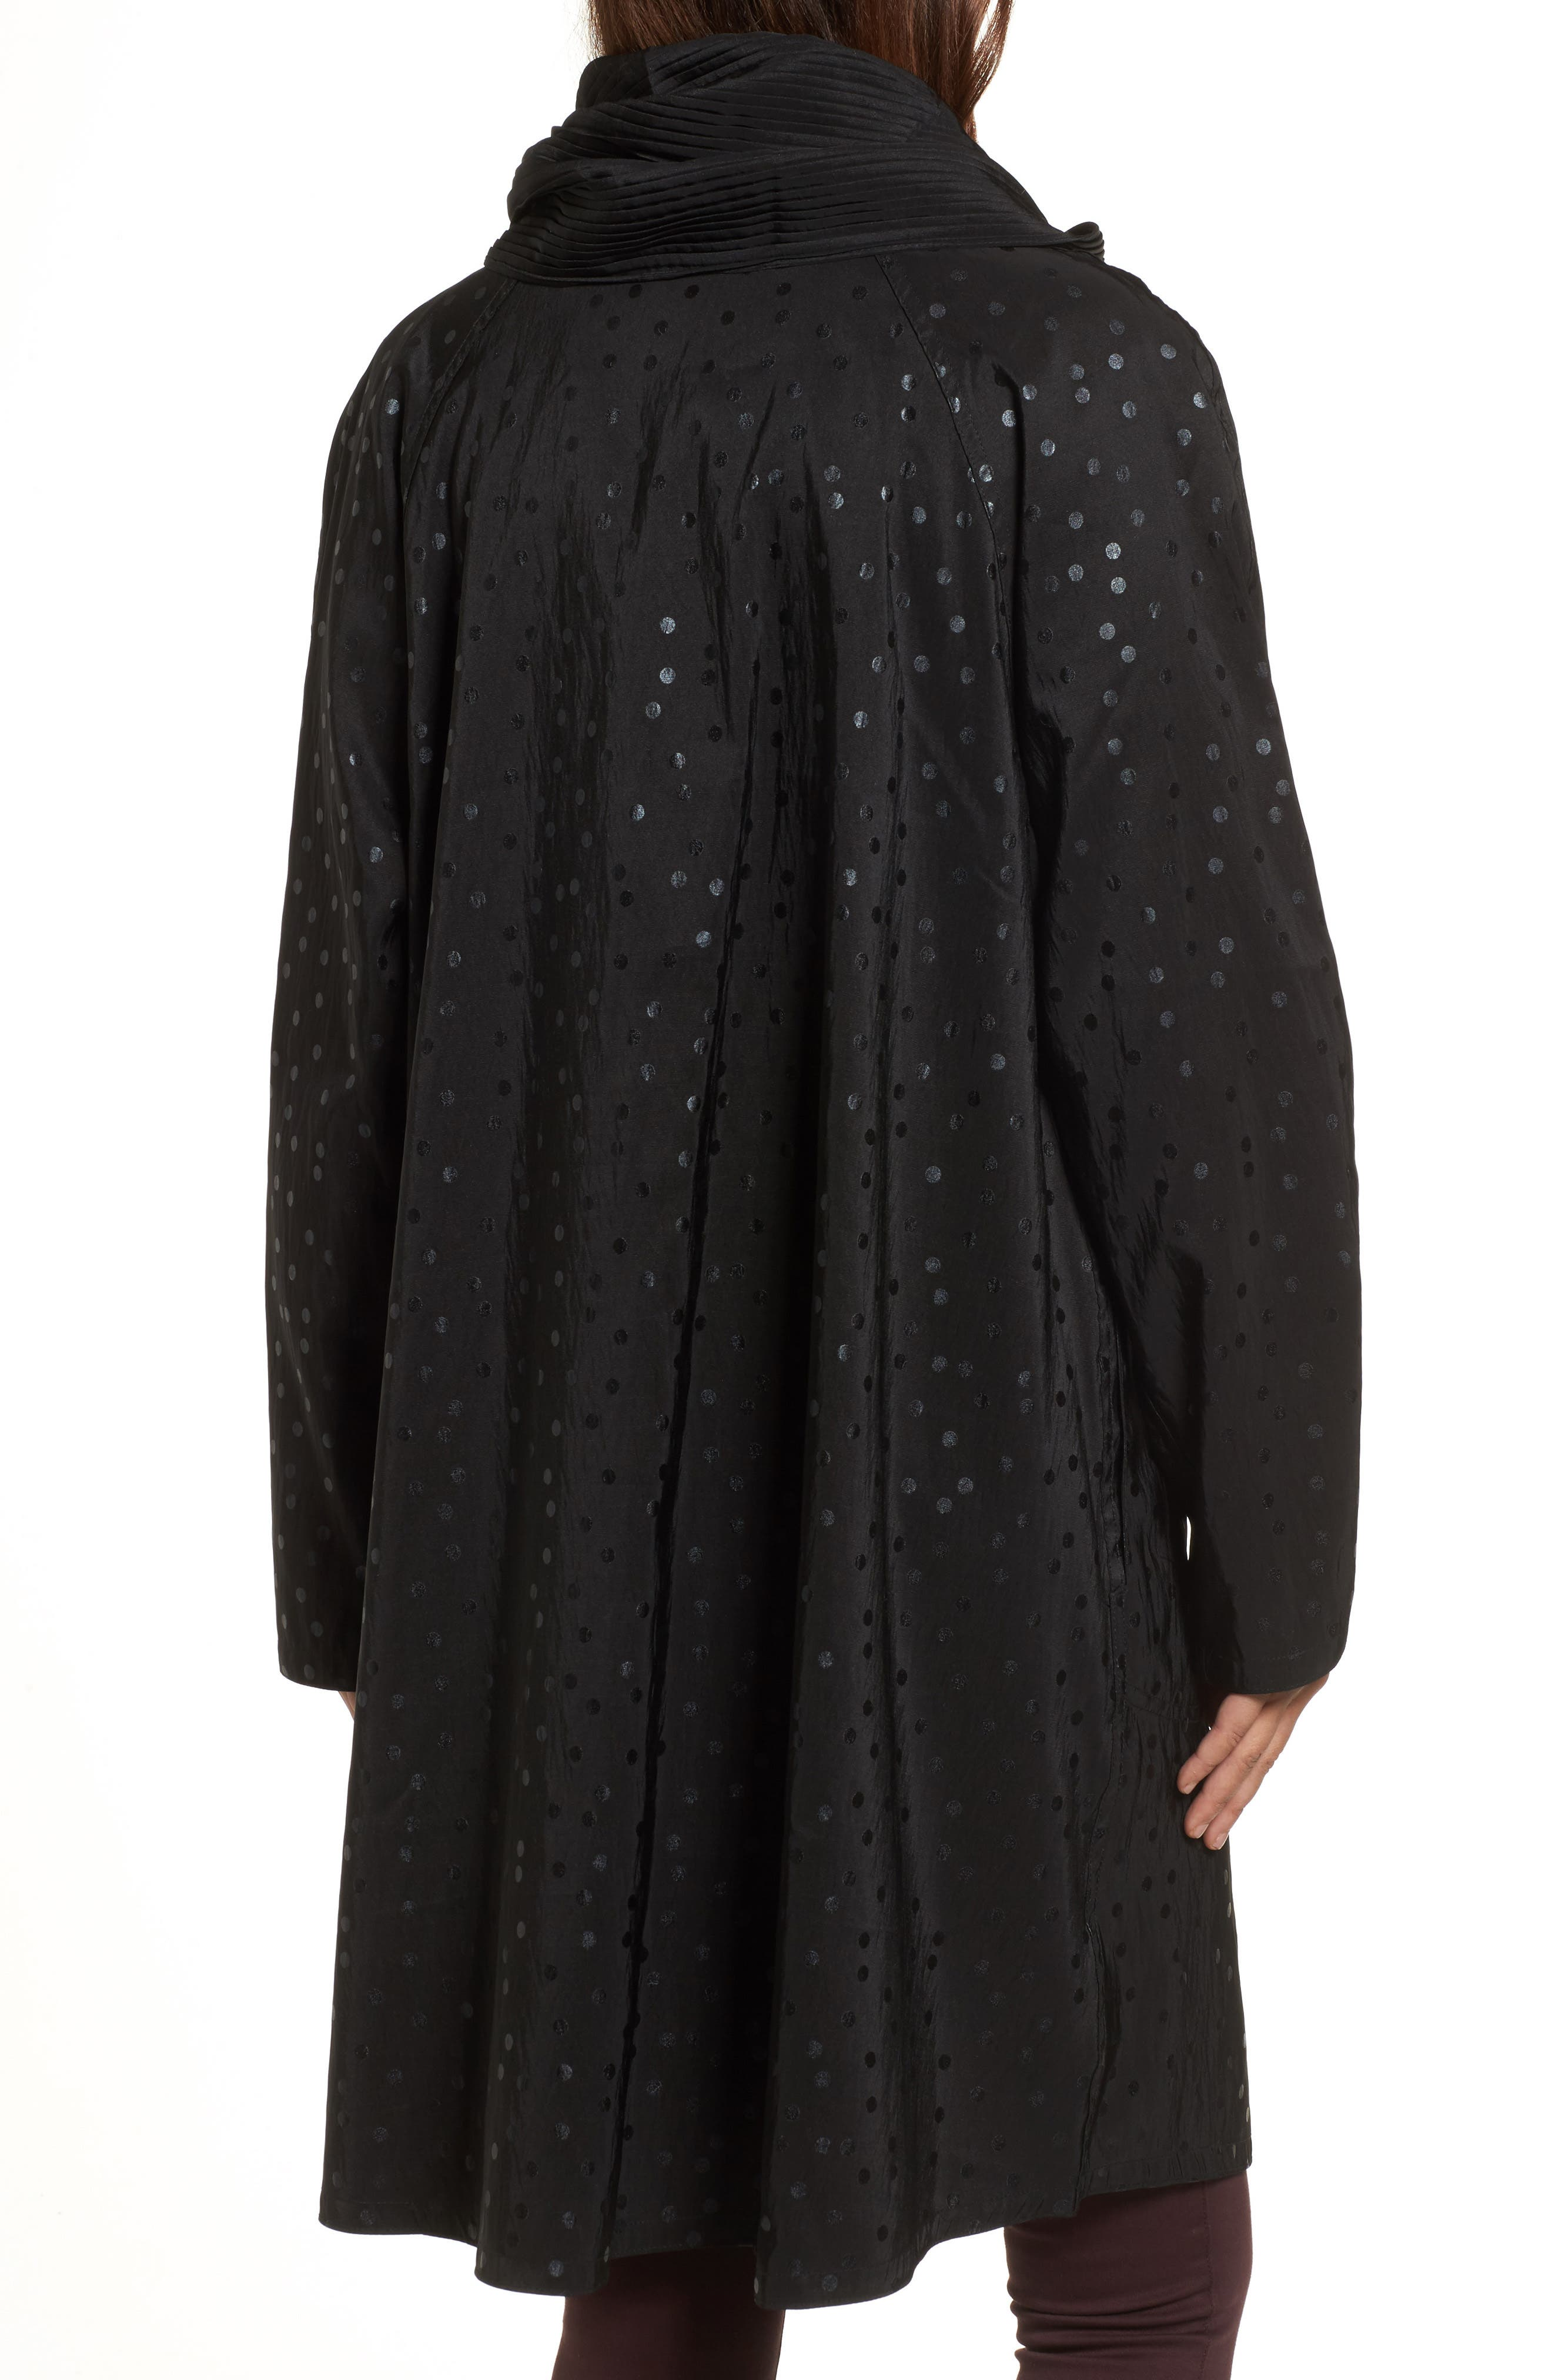 'Donatella' Reversible Dot Pleat Hood Packable Travel Coat,                             Alternate thumbnail 2, color,                             Black Dot